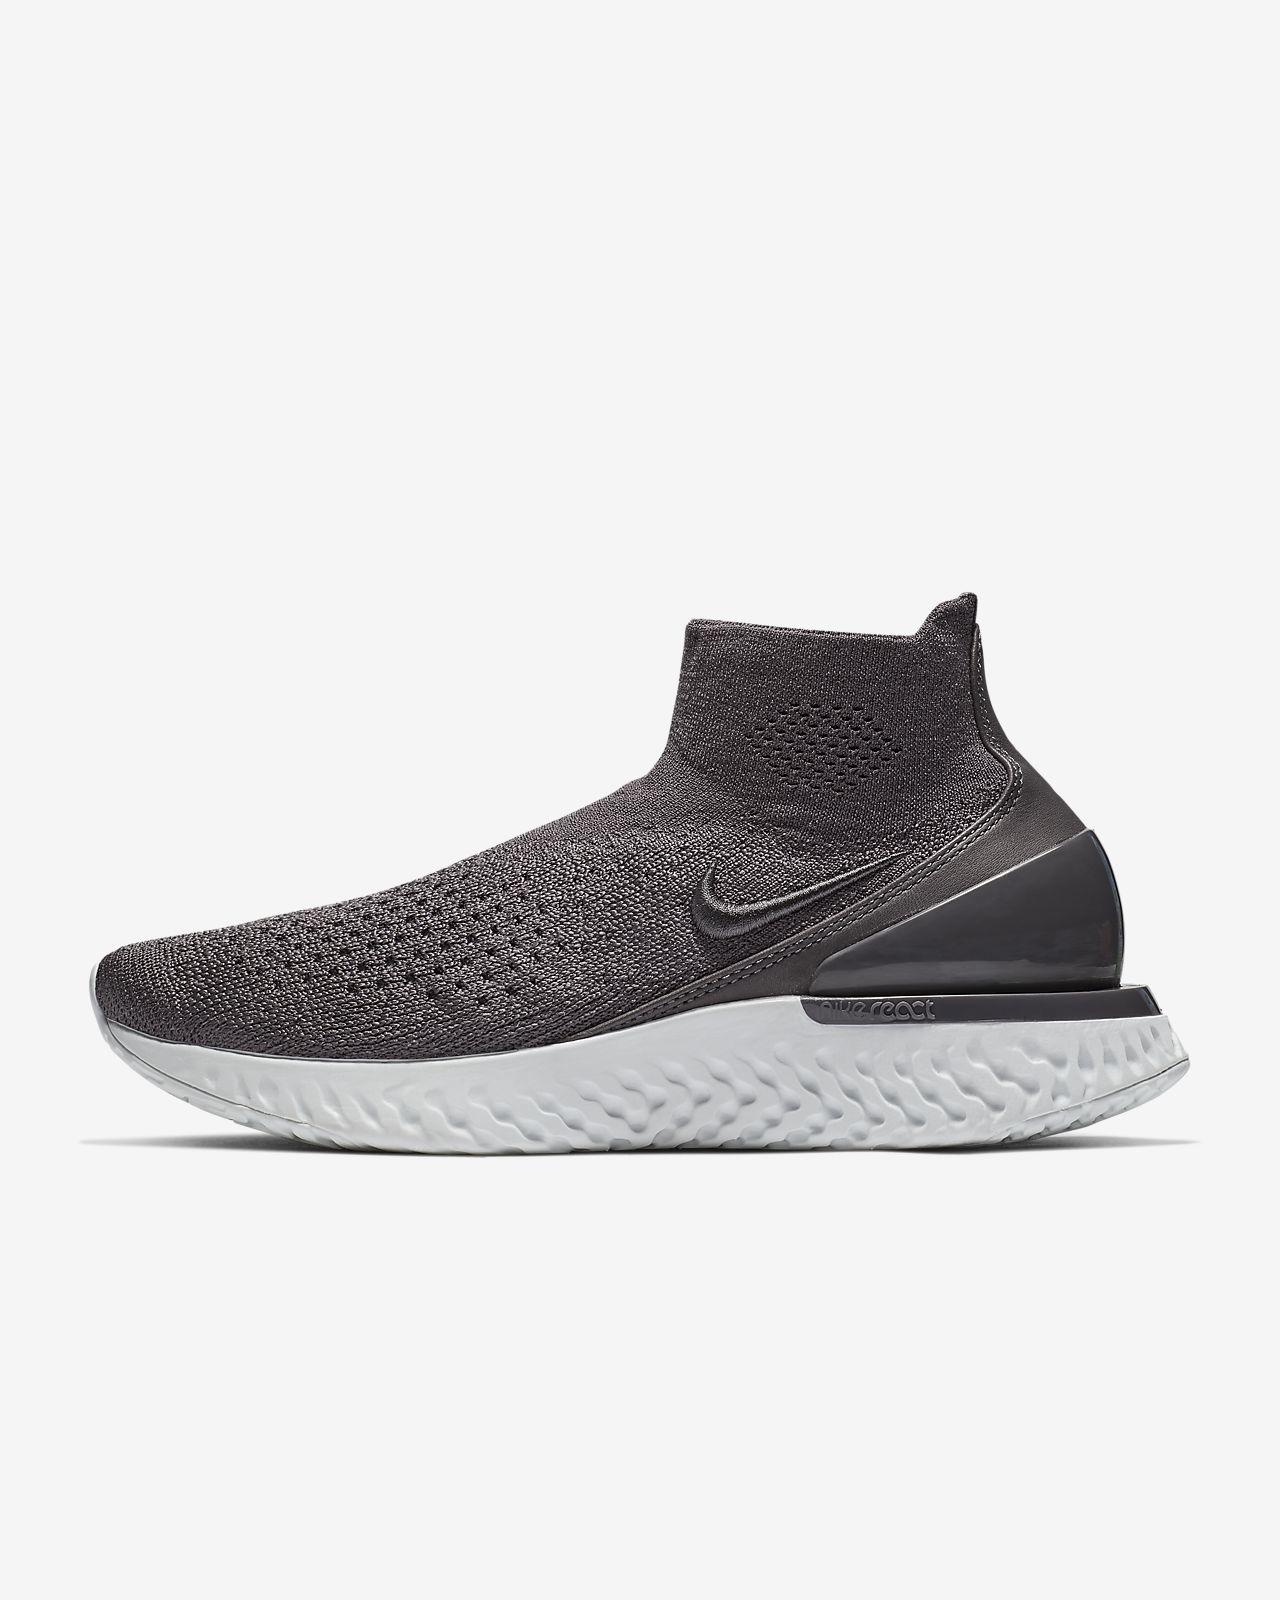 detailed look 5736a e8033 ... Löparsko Nike Rise React Flyknit för kvinnor